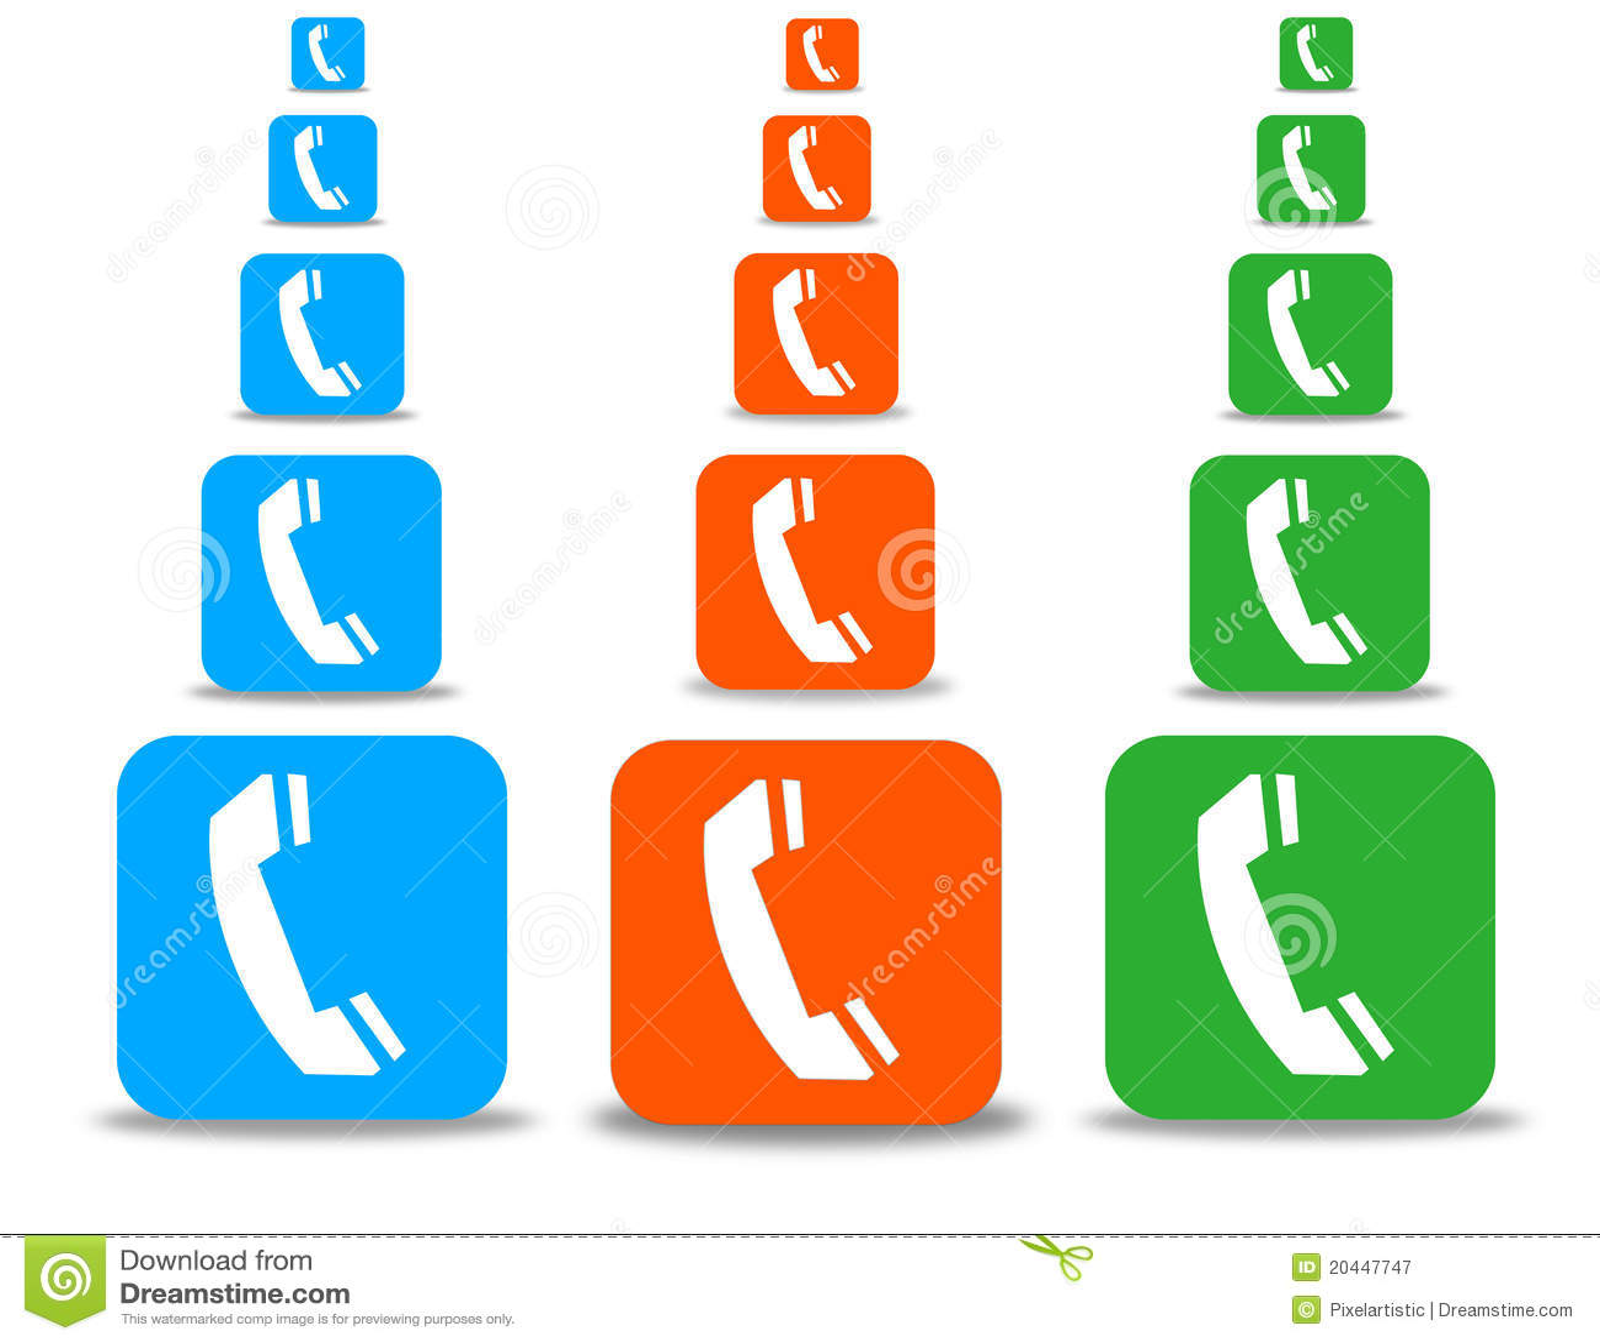 Phone series